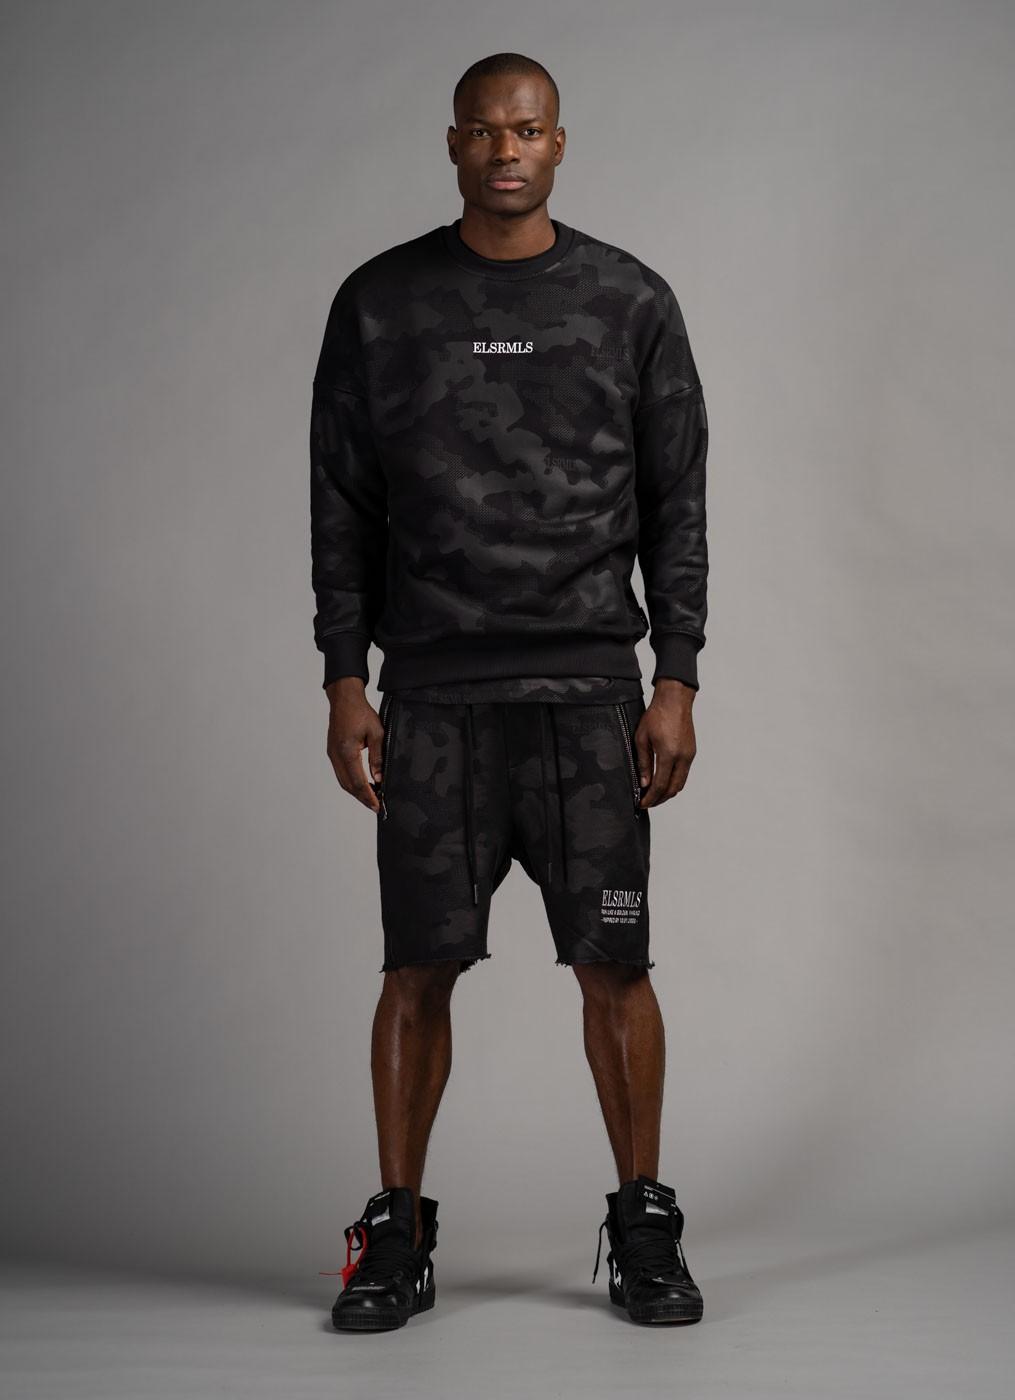 ER Naveed camou - shorts